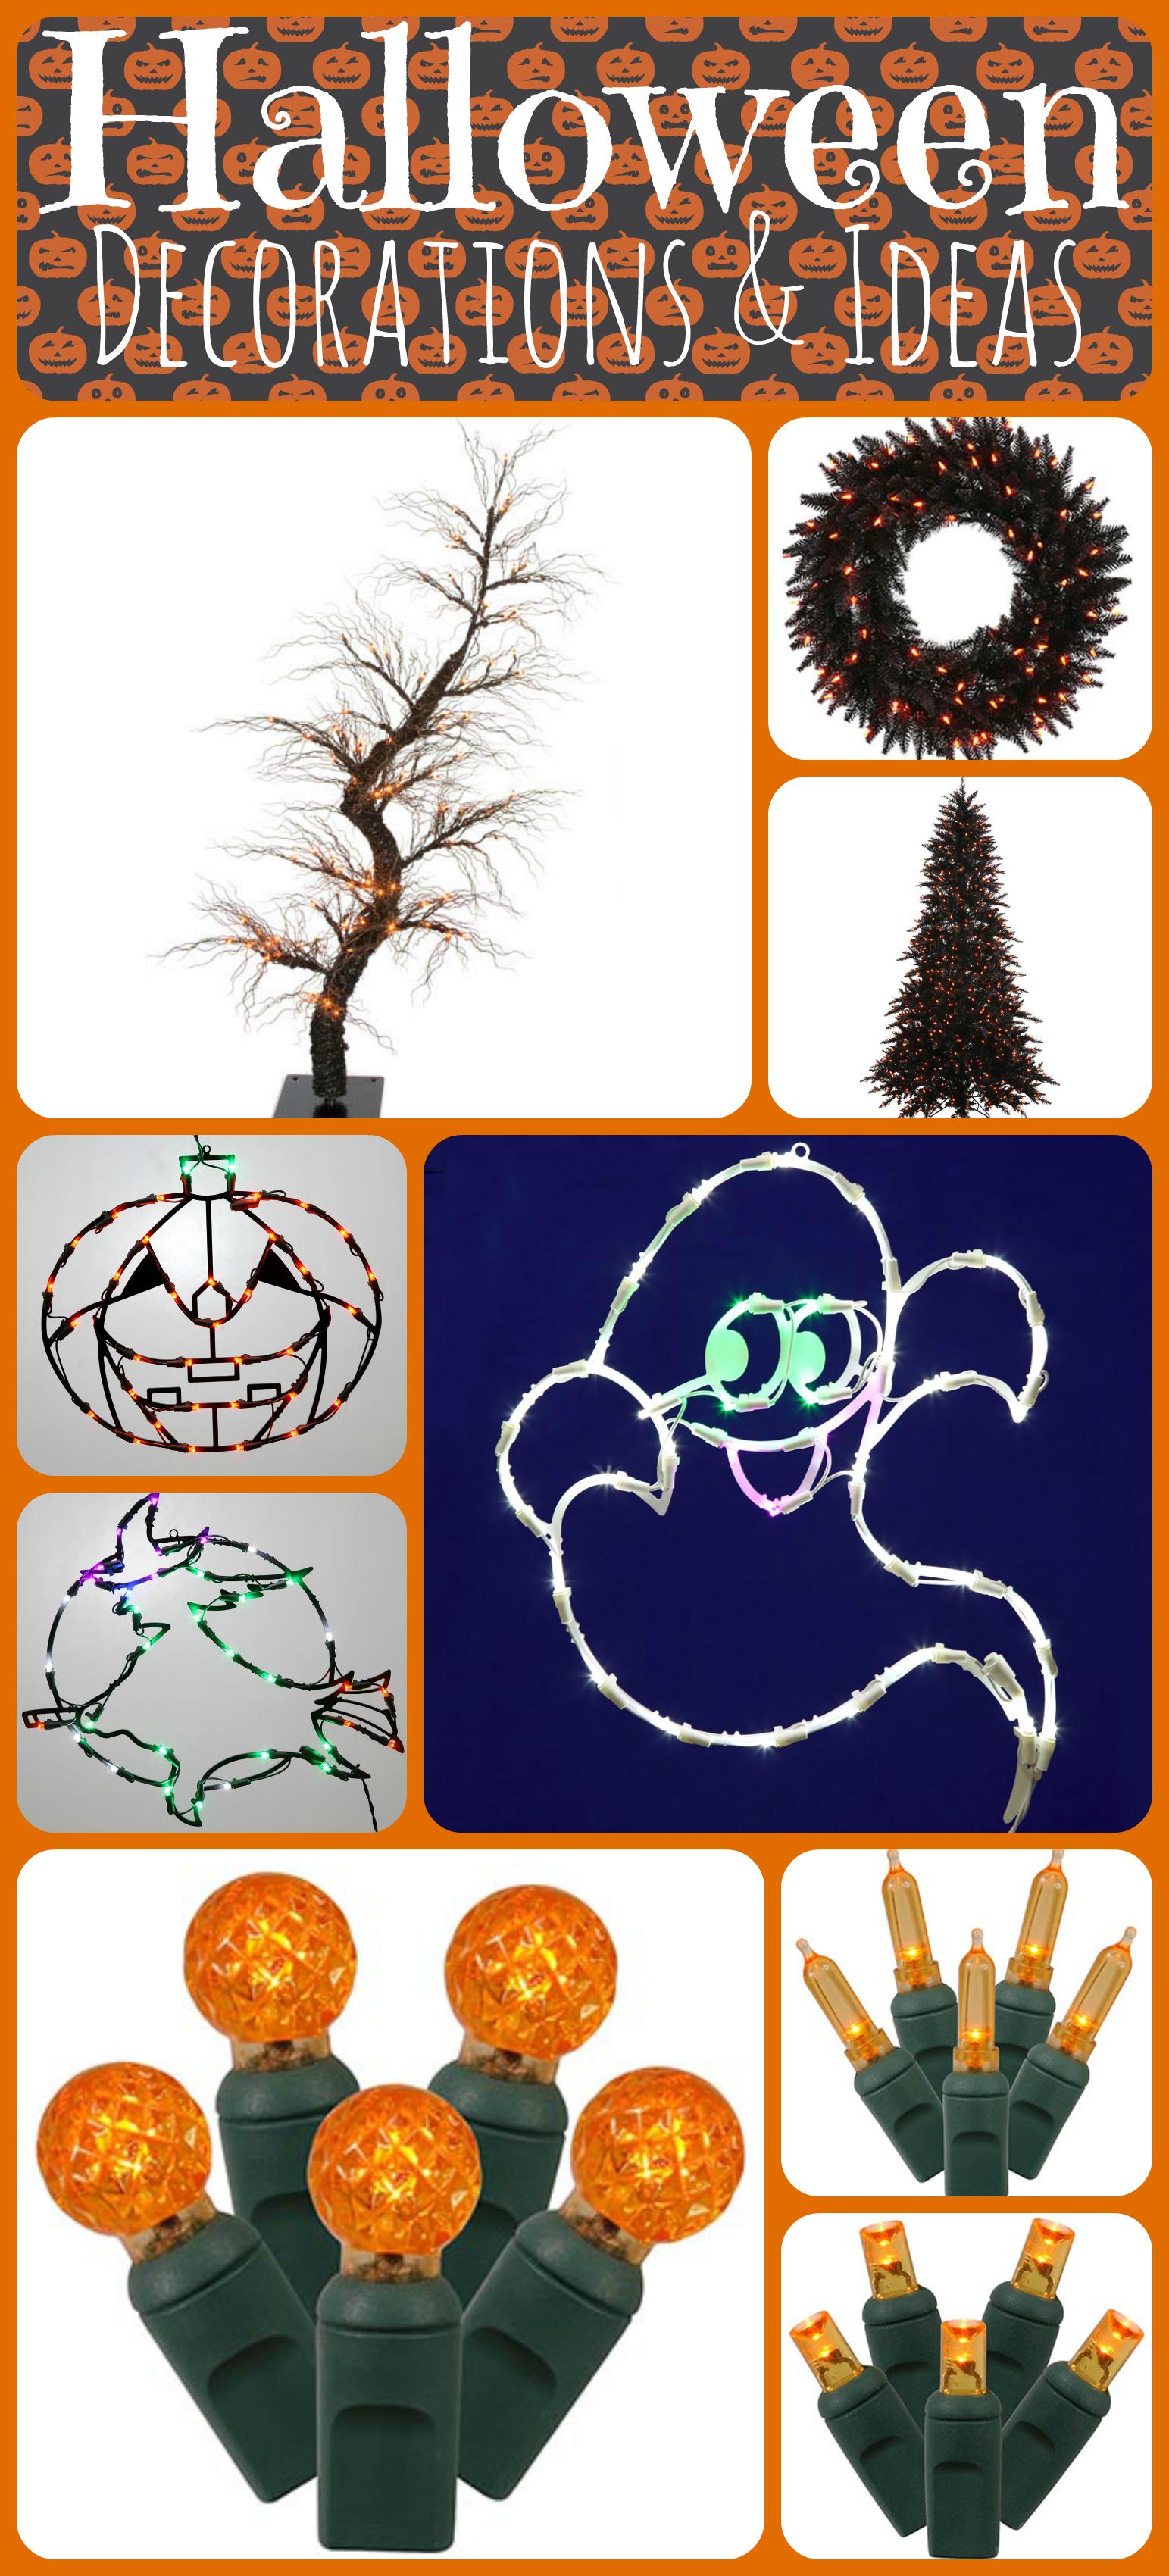 Halloween Decorations & Ideas